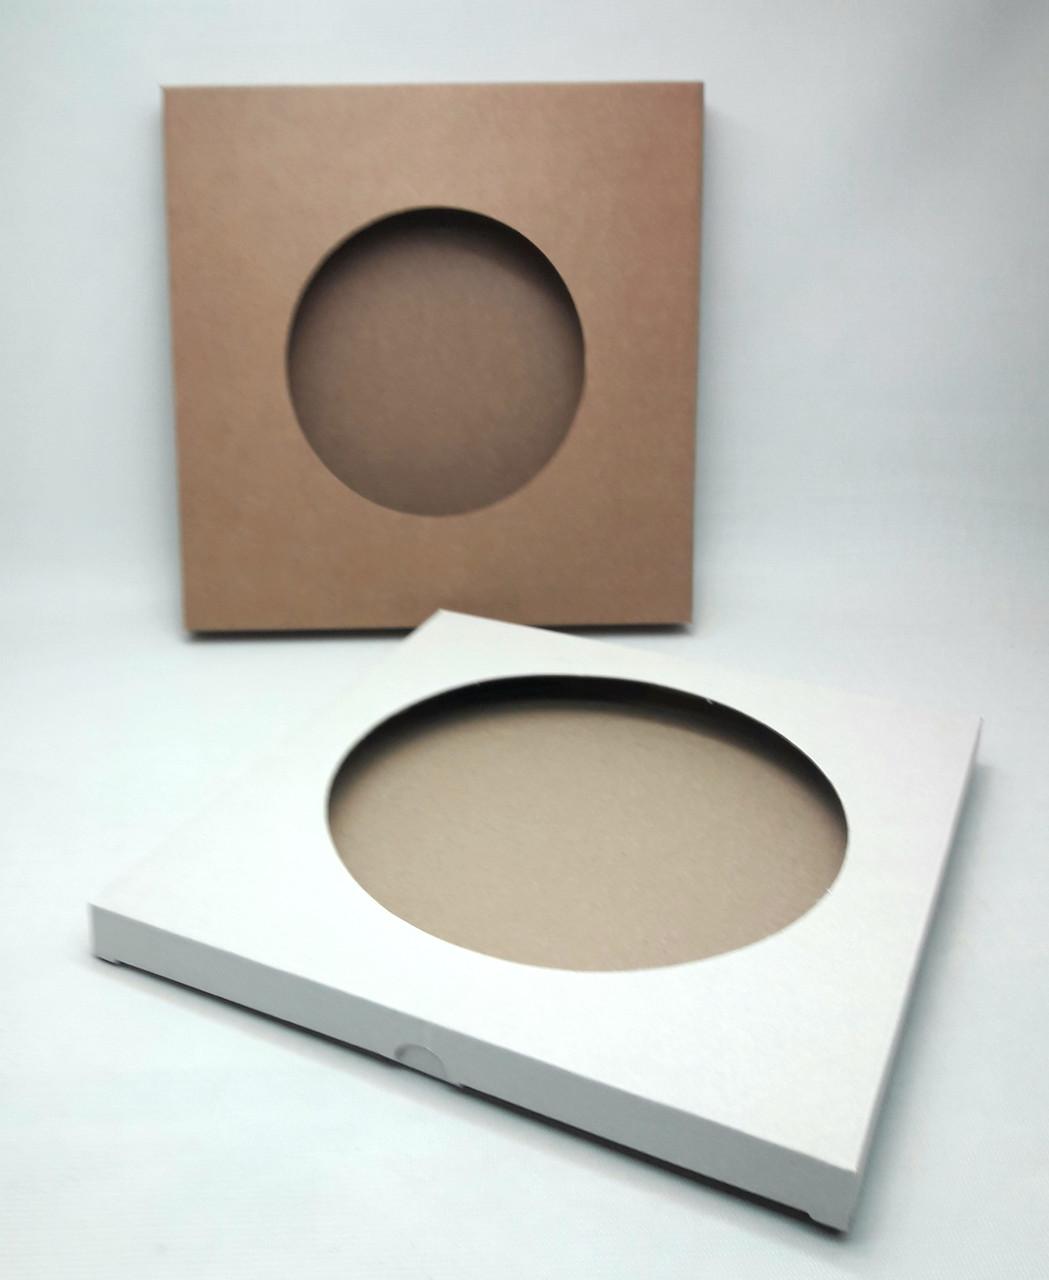 УПАКОВКА под тарелку . 275Х20Х275 (диаметр окошка 210 мм. )